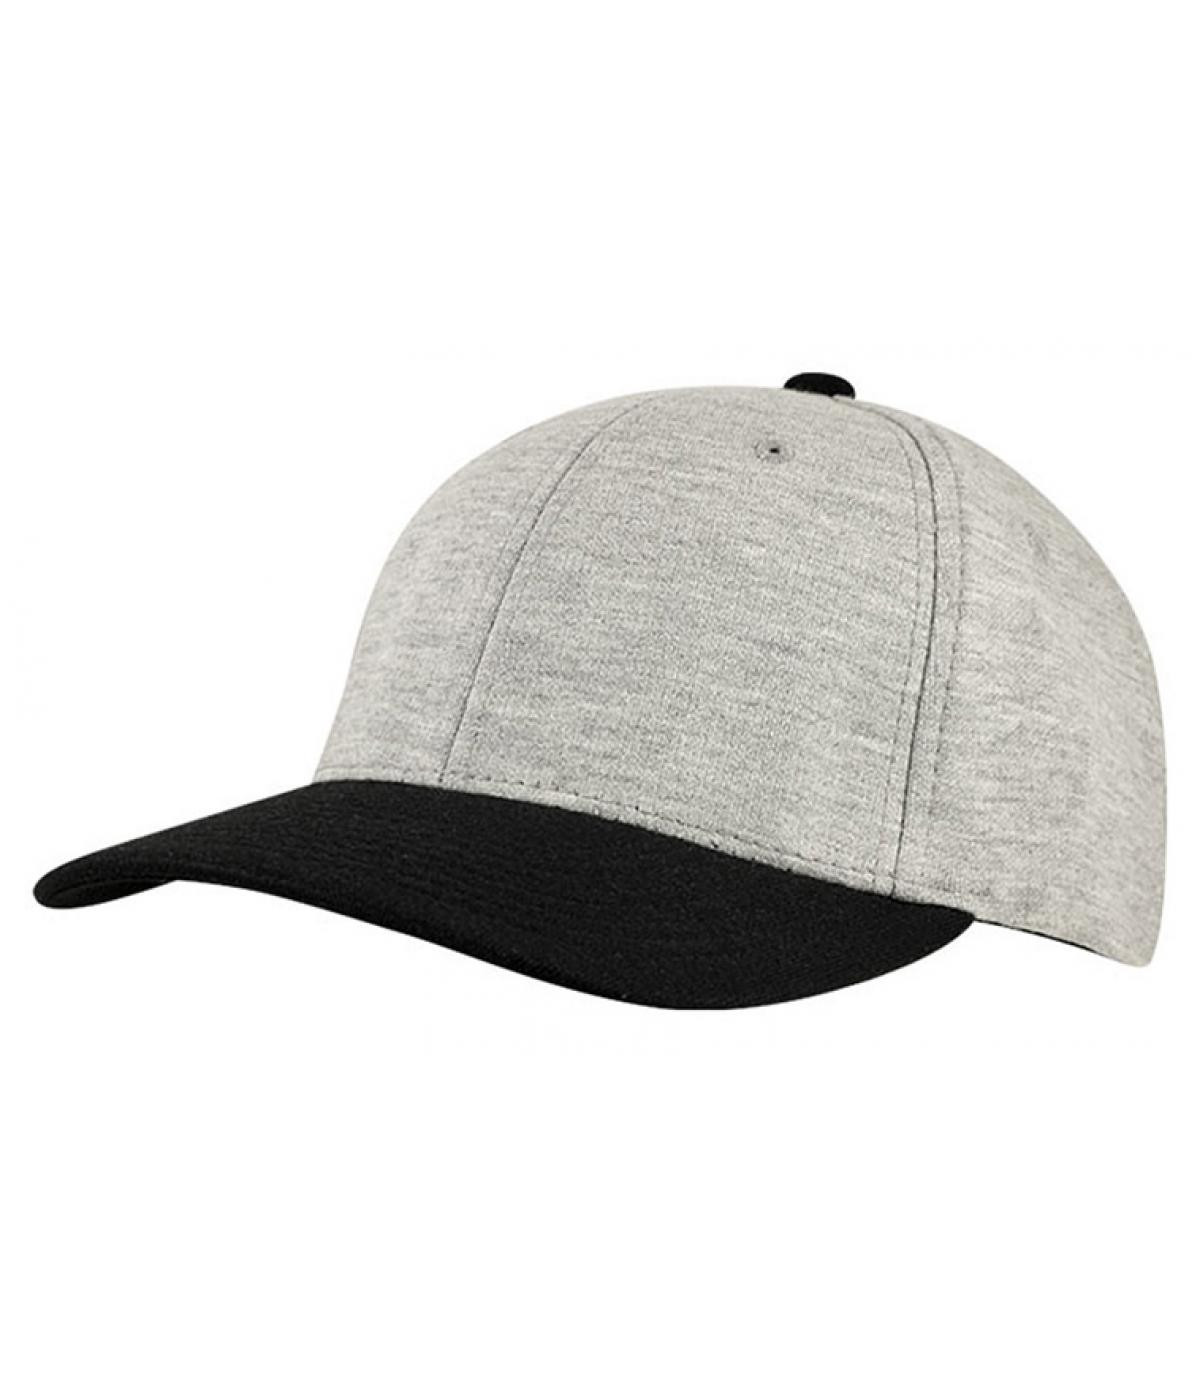 Gorra jersey grise negro